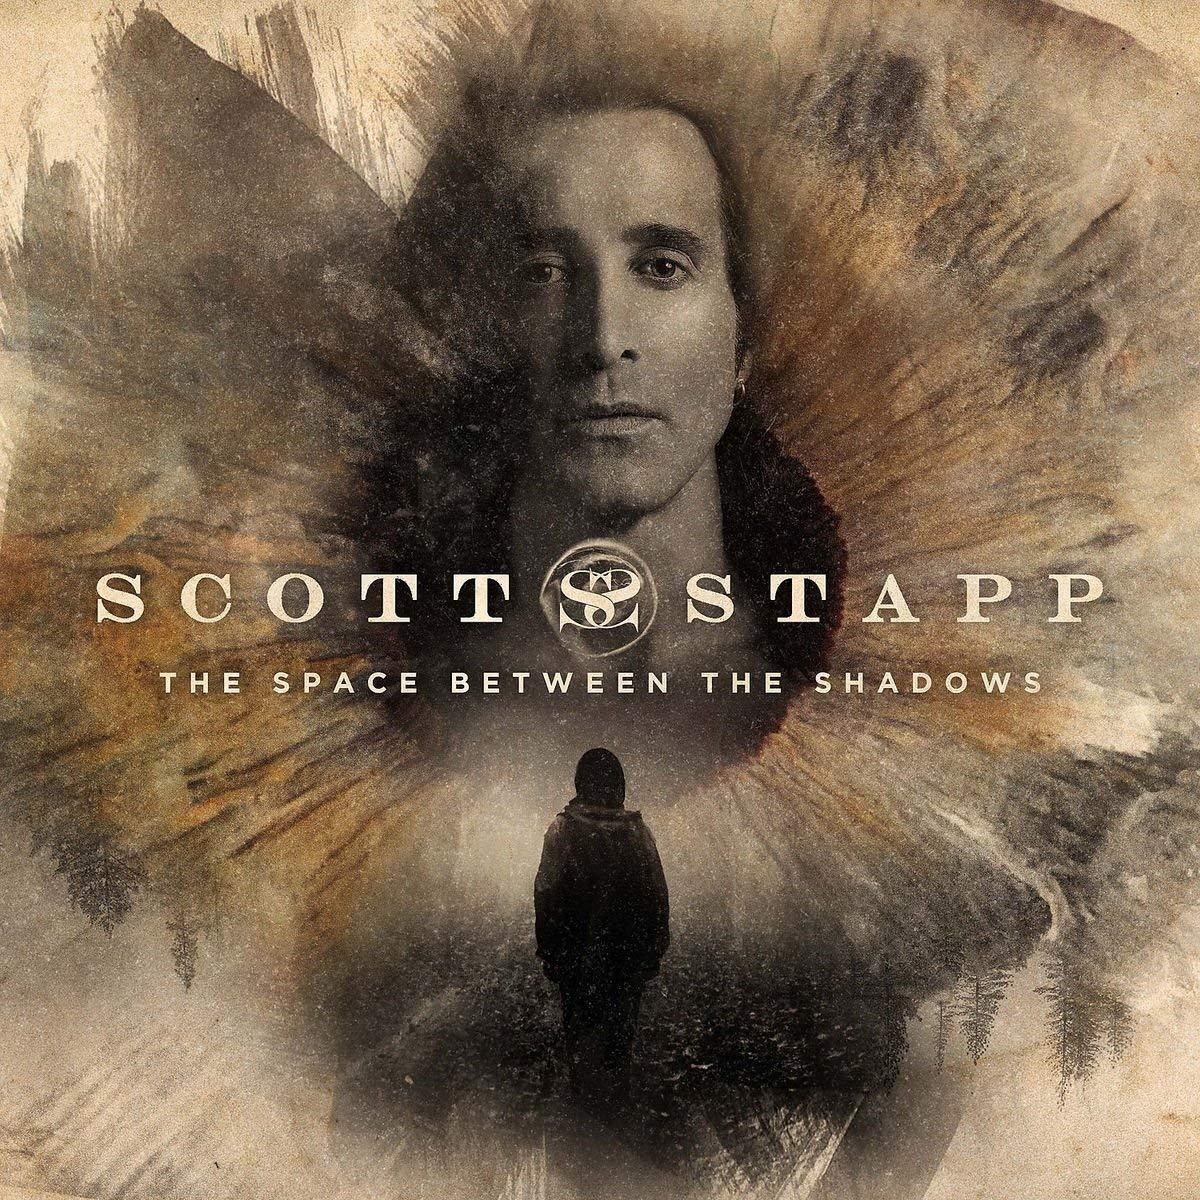 The Space Between The Shadows Scott Stapp Amazon De Musik